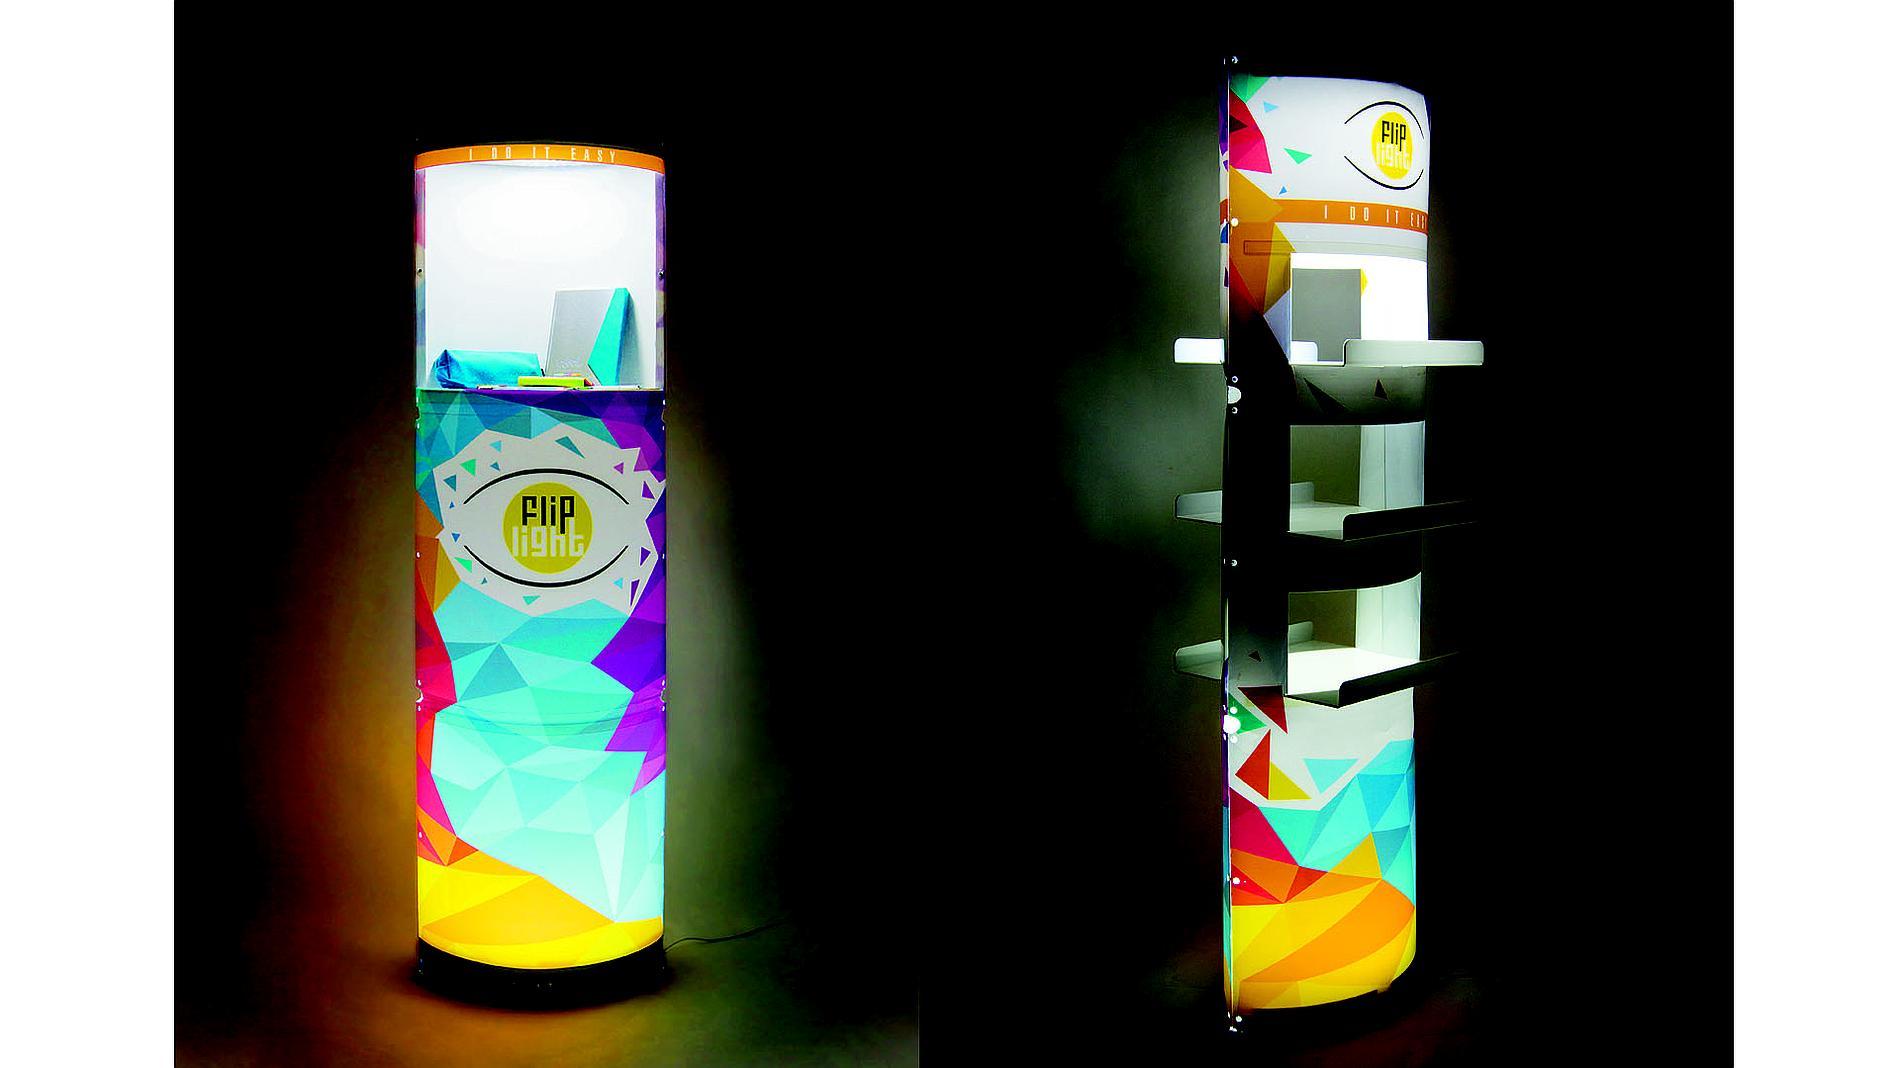 illuminated, portable display